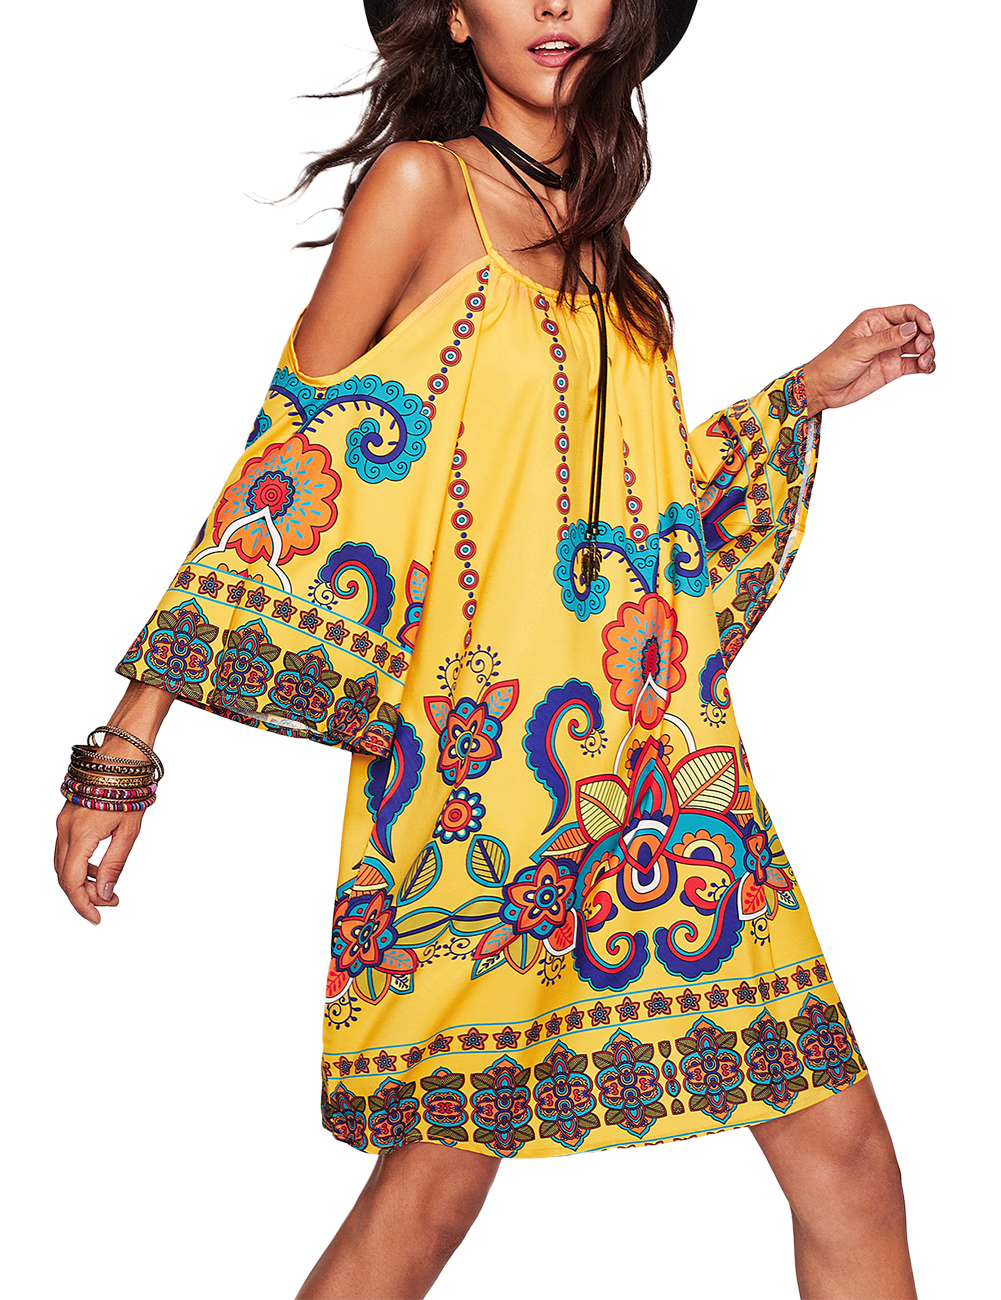 [EU Direct] Women Casual Printing Bohemia Skirt Sexy Half Sleeve Strapless V-neck Sling Dress yellow_XL